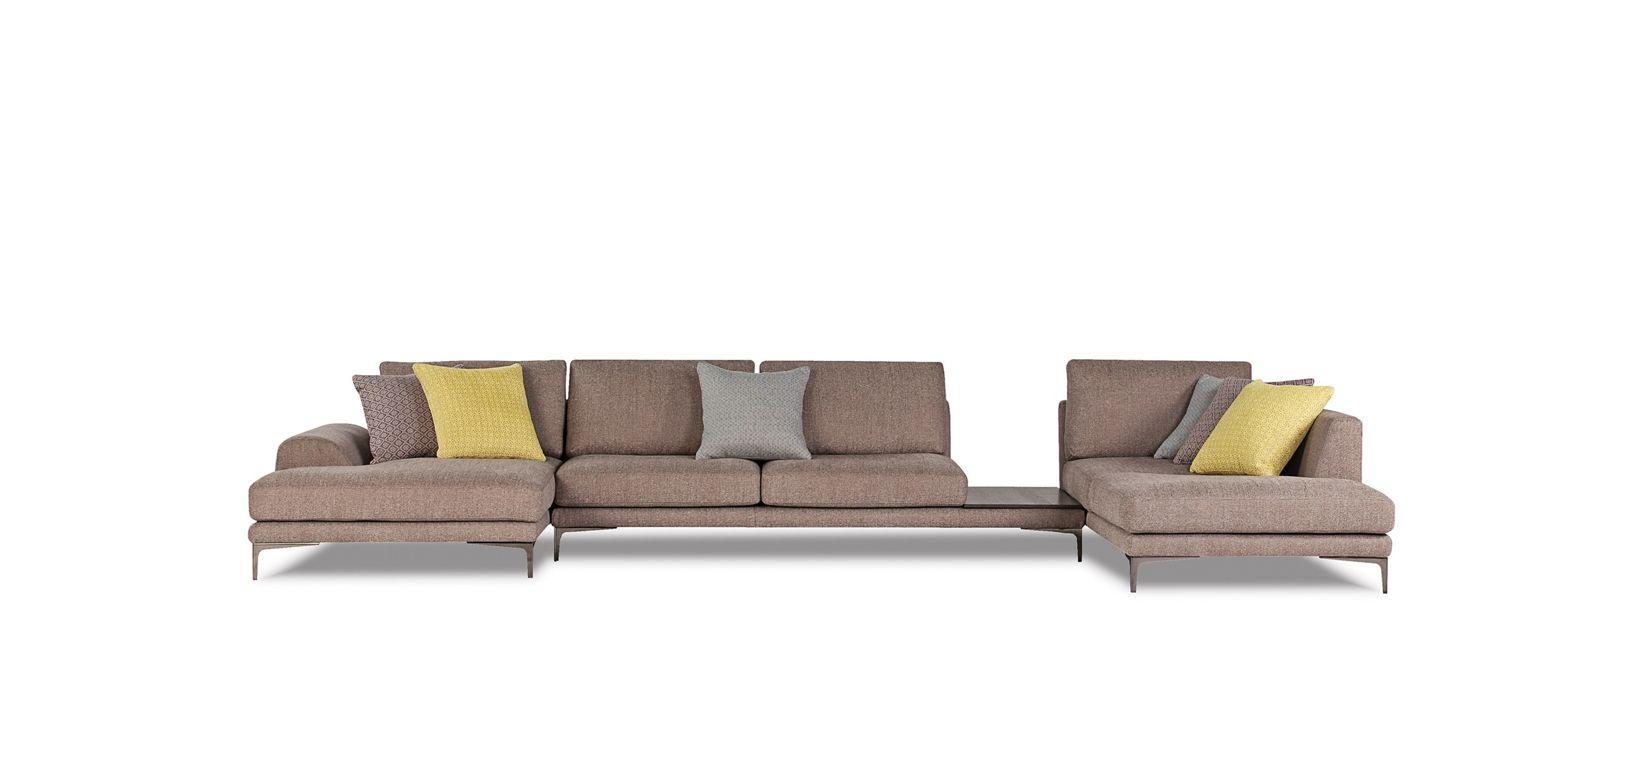 exclamation corner composition roche bobois. Black Bedroom Furniture Sets. Home Design Ideas